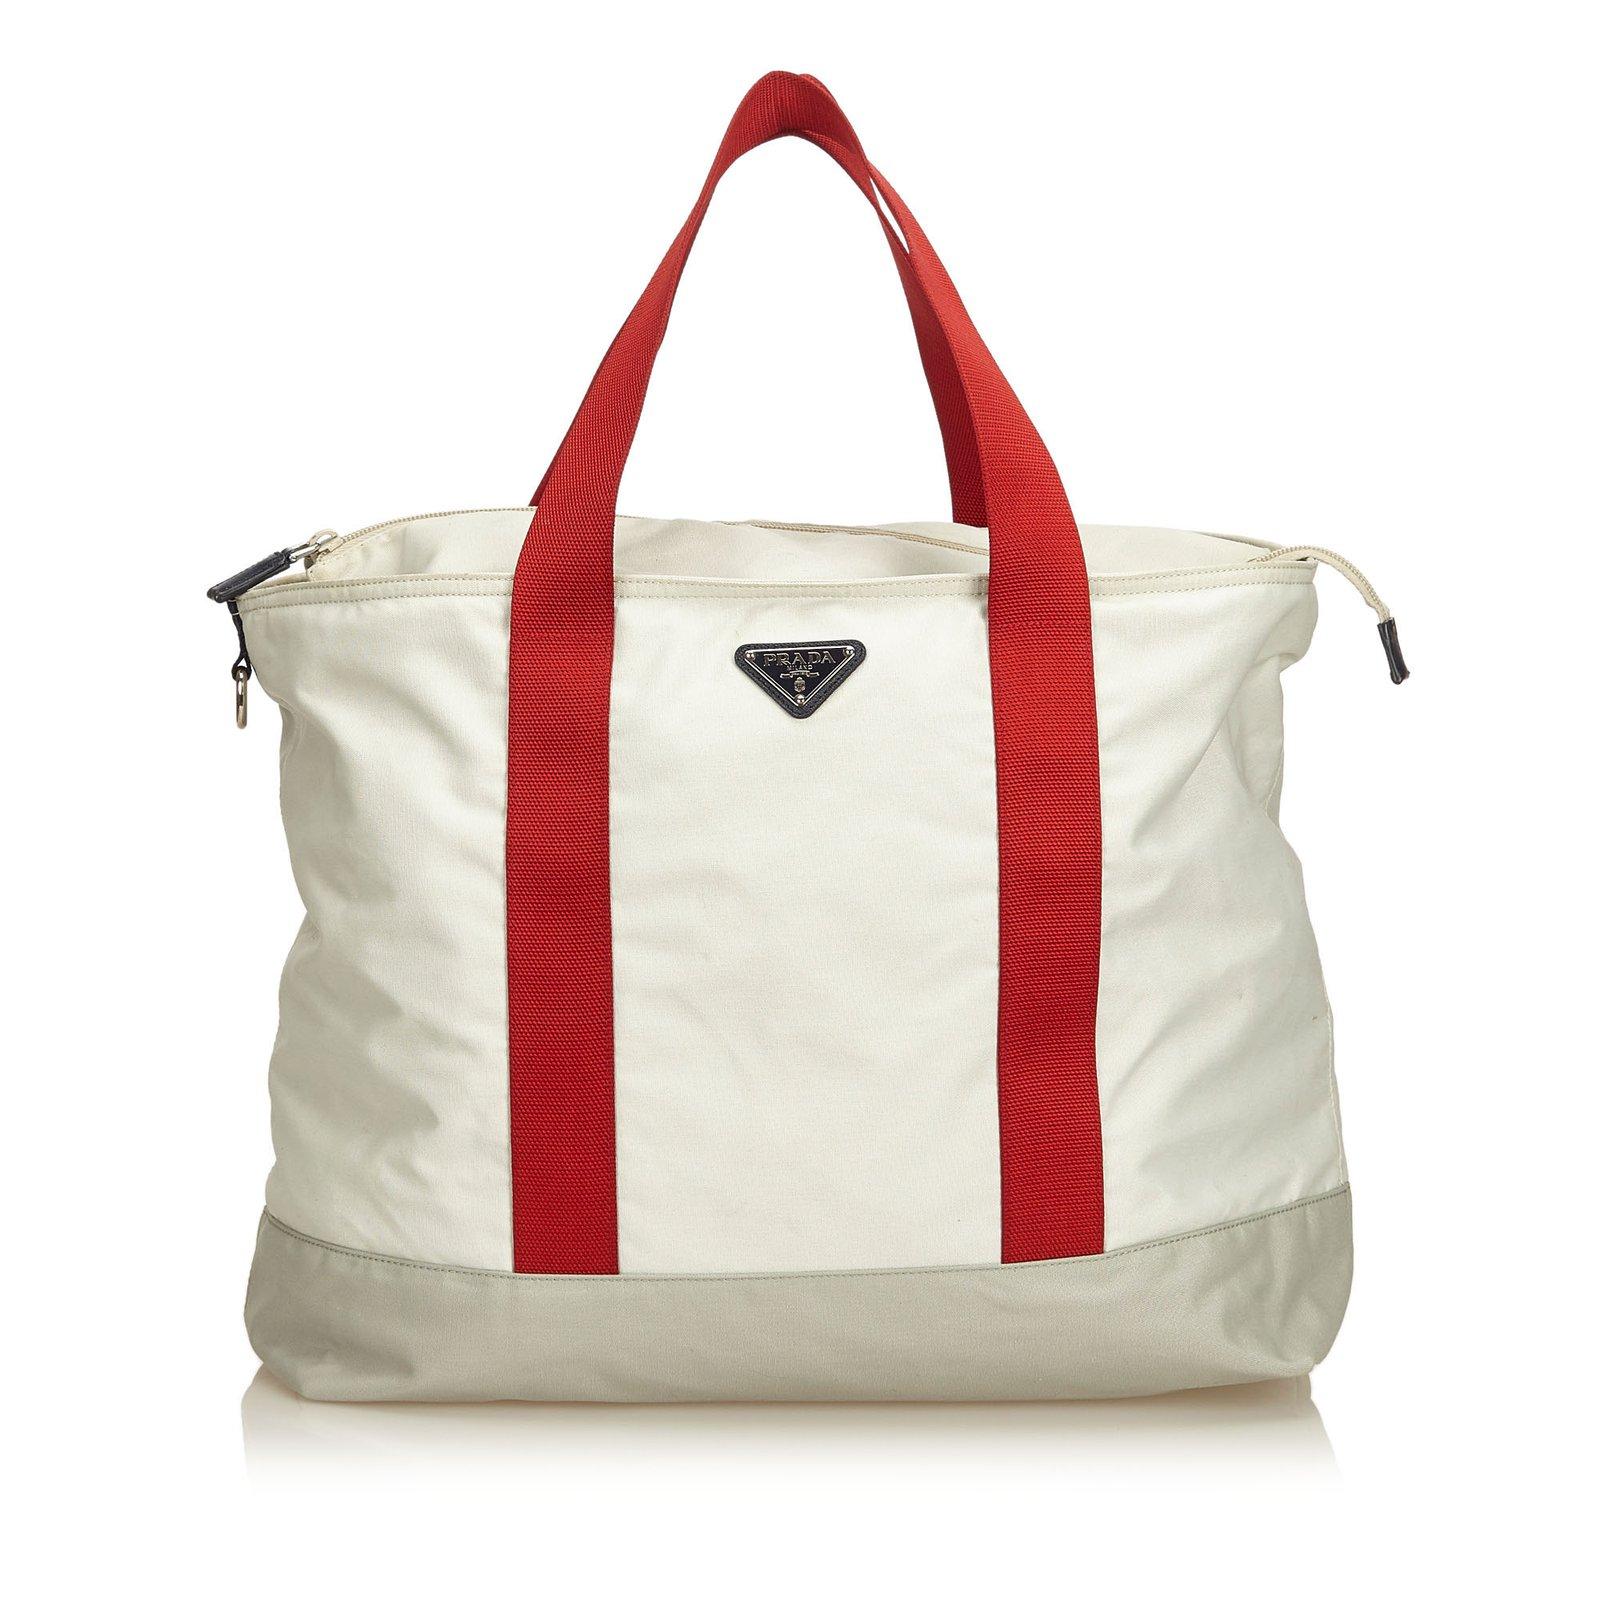 5a89f6d68b6265 Prada Nylon Tote Bag Totes Cloth,Nylon,Cloth White,Red,Cream ref ...